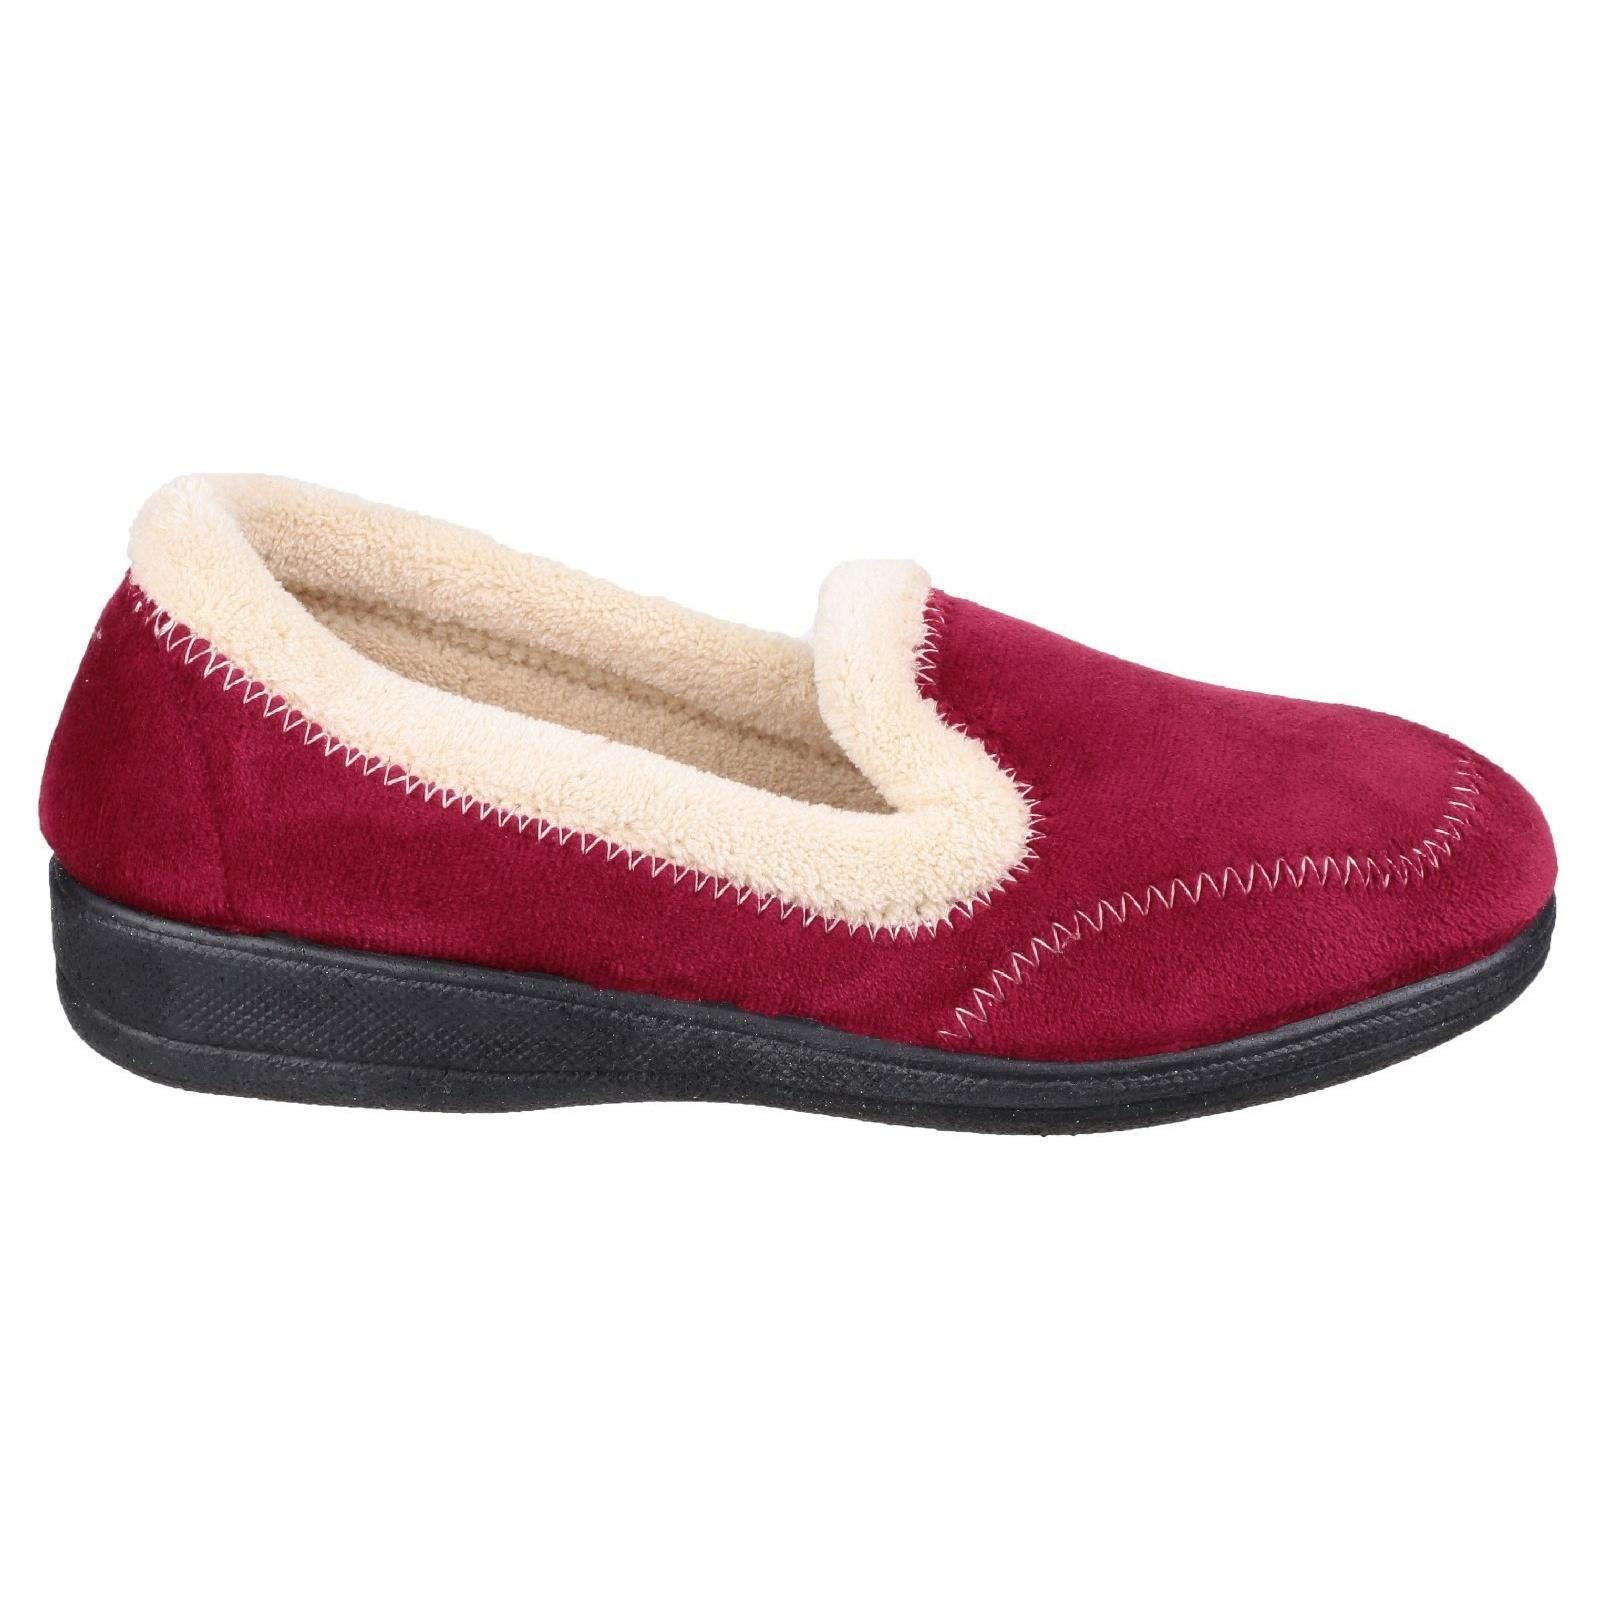 2 Colours 6 Sizes UK 3-8 FS3261 Mirak Womens//Ladies Maier Classic Slippers